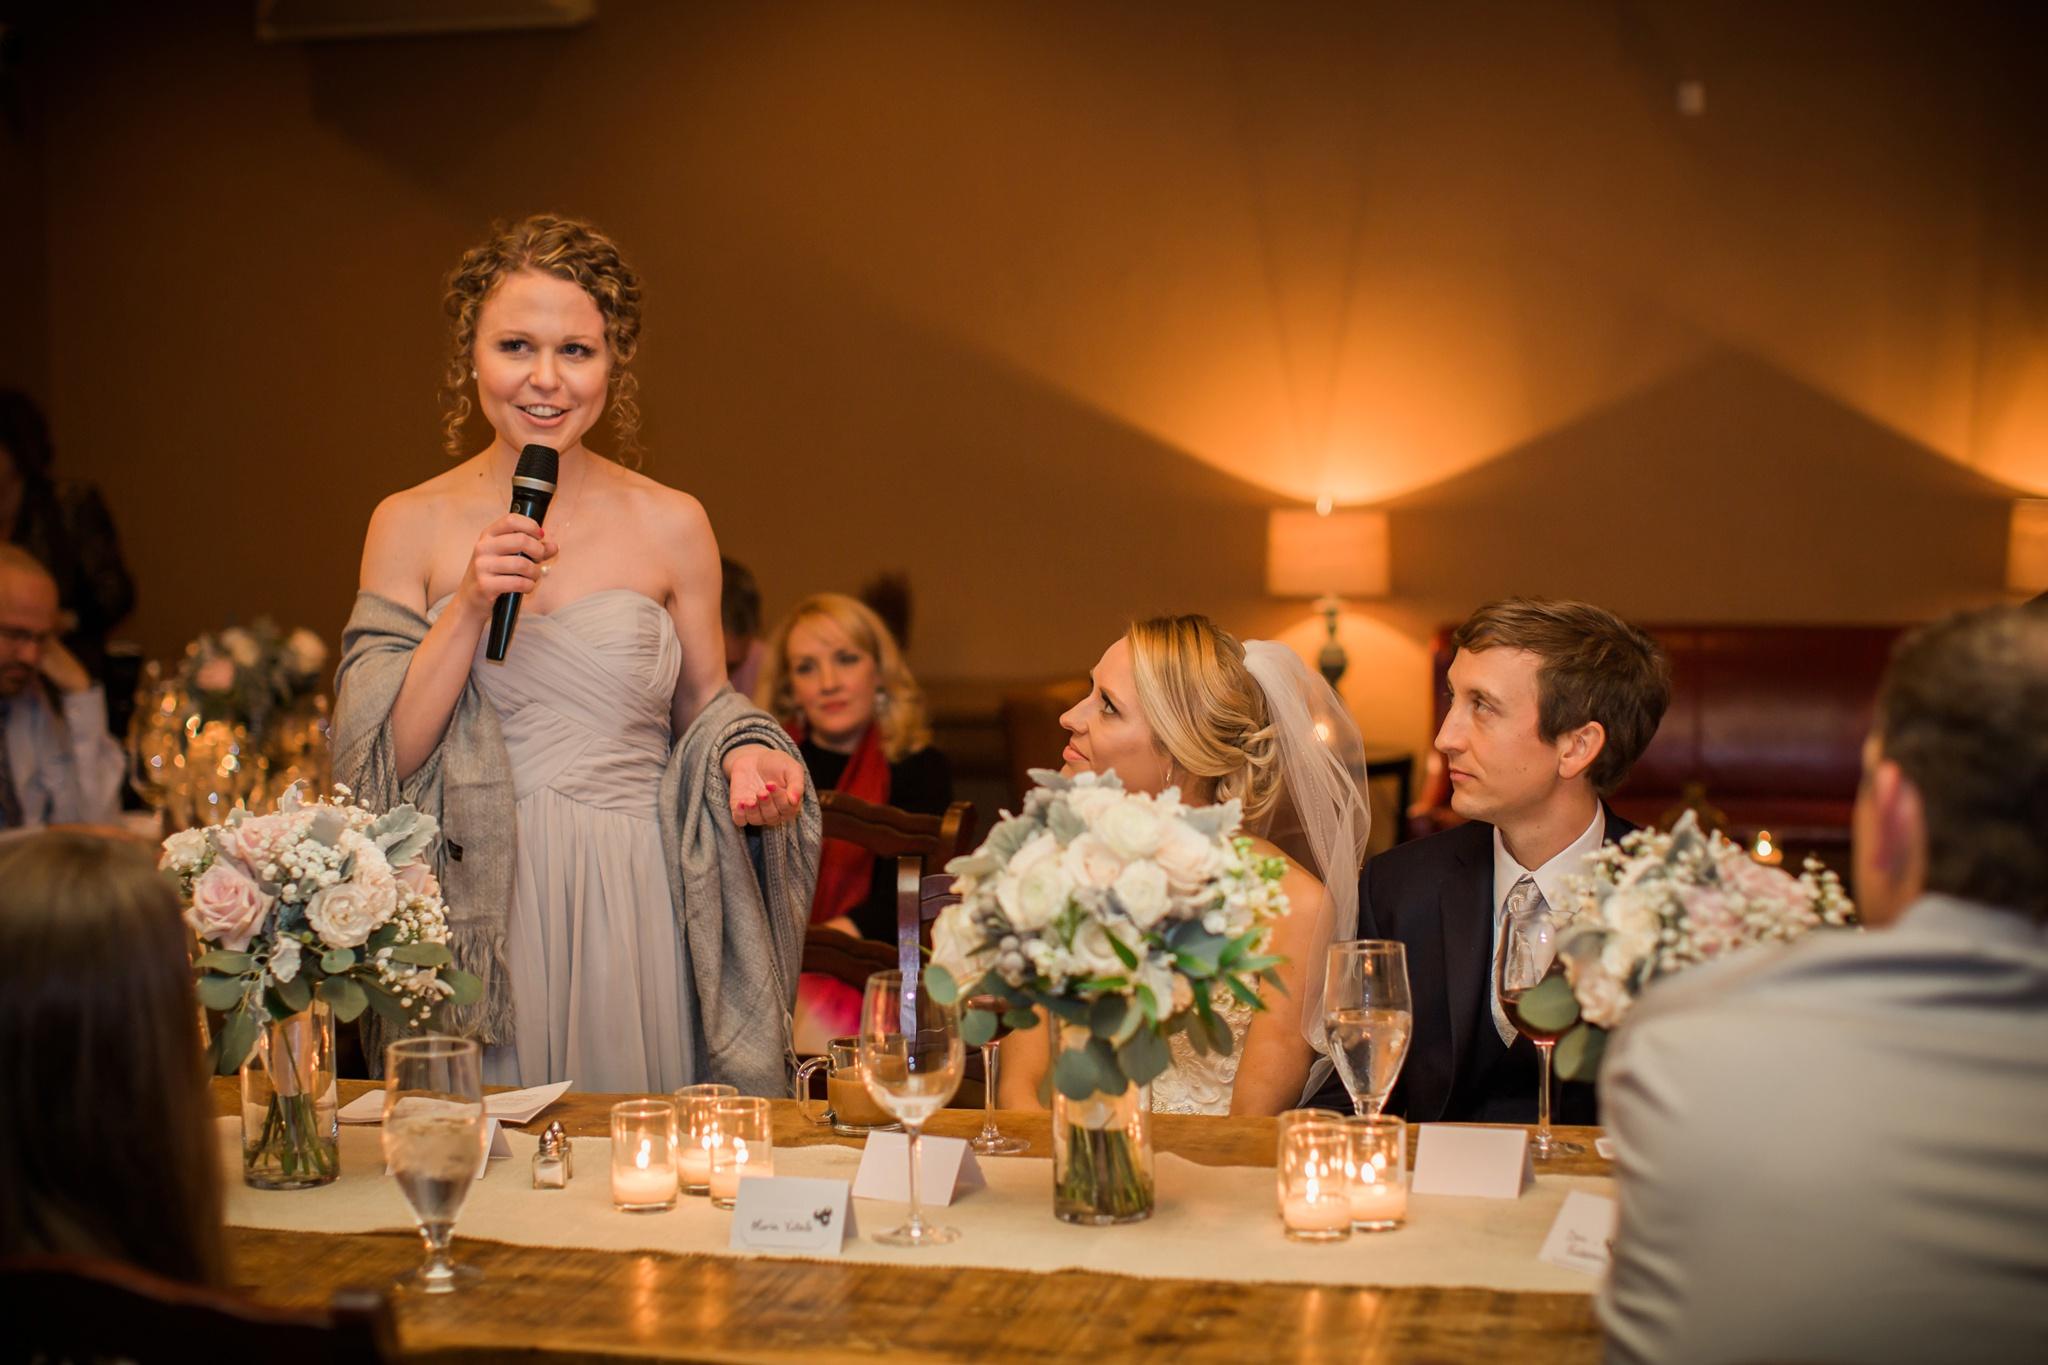 St. Louis Wedding Photographer   Chandler Rose Photography_0064.jpg